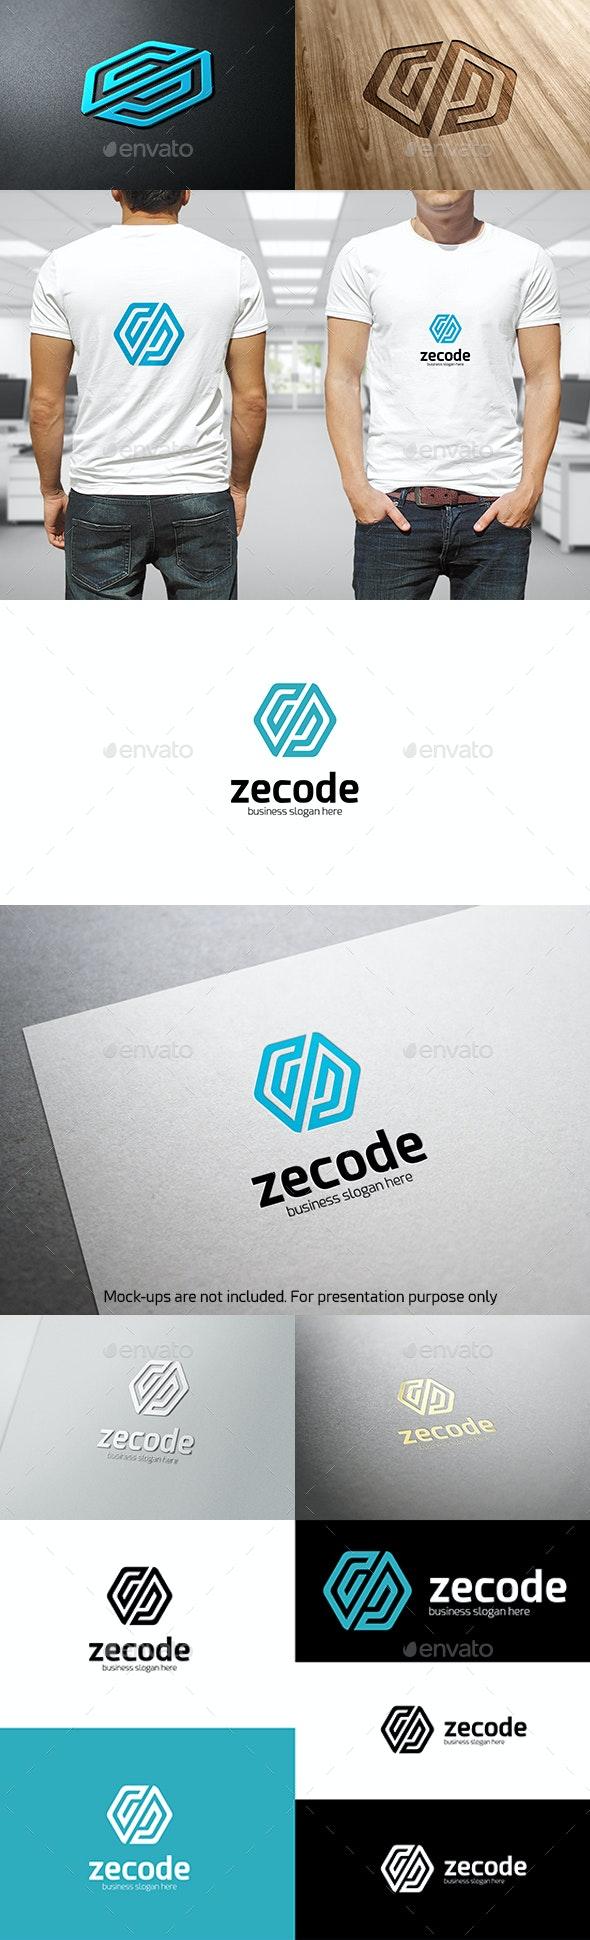 Zecode - Hexagonal Abstract Infinity Code Logo Symbol - Symbols Logo Templates